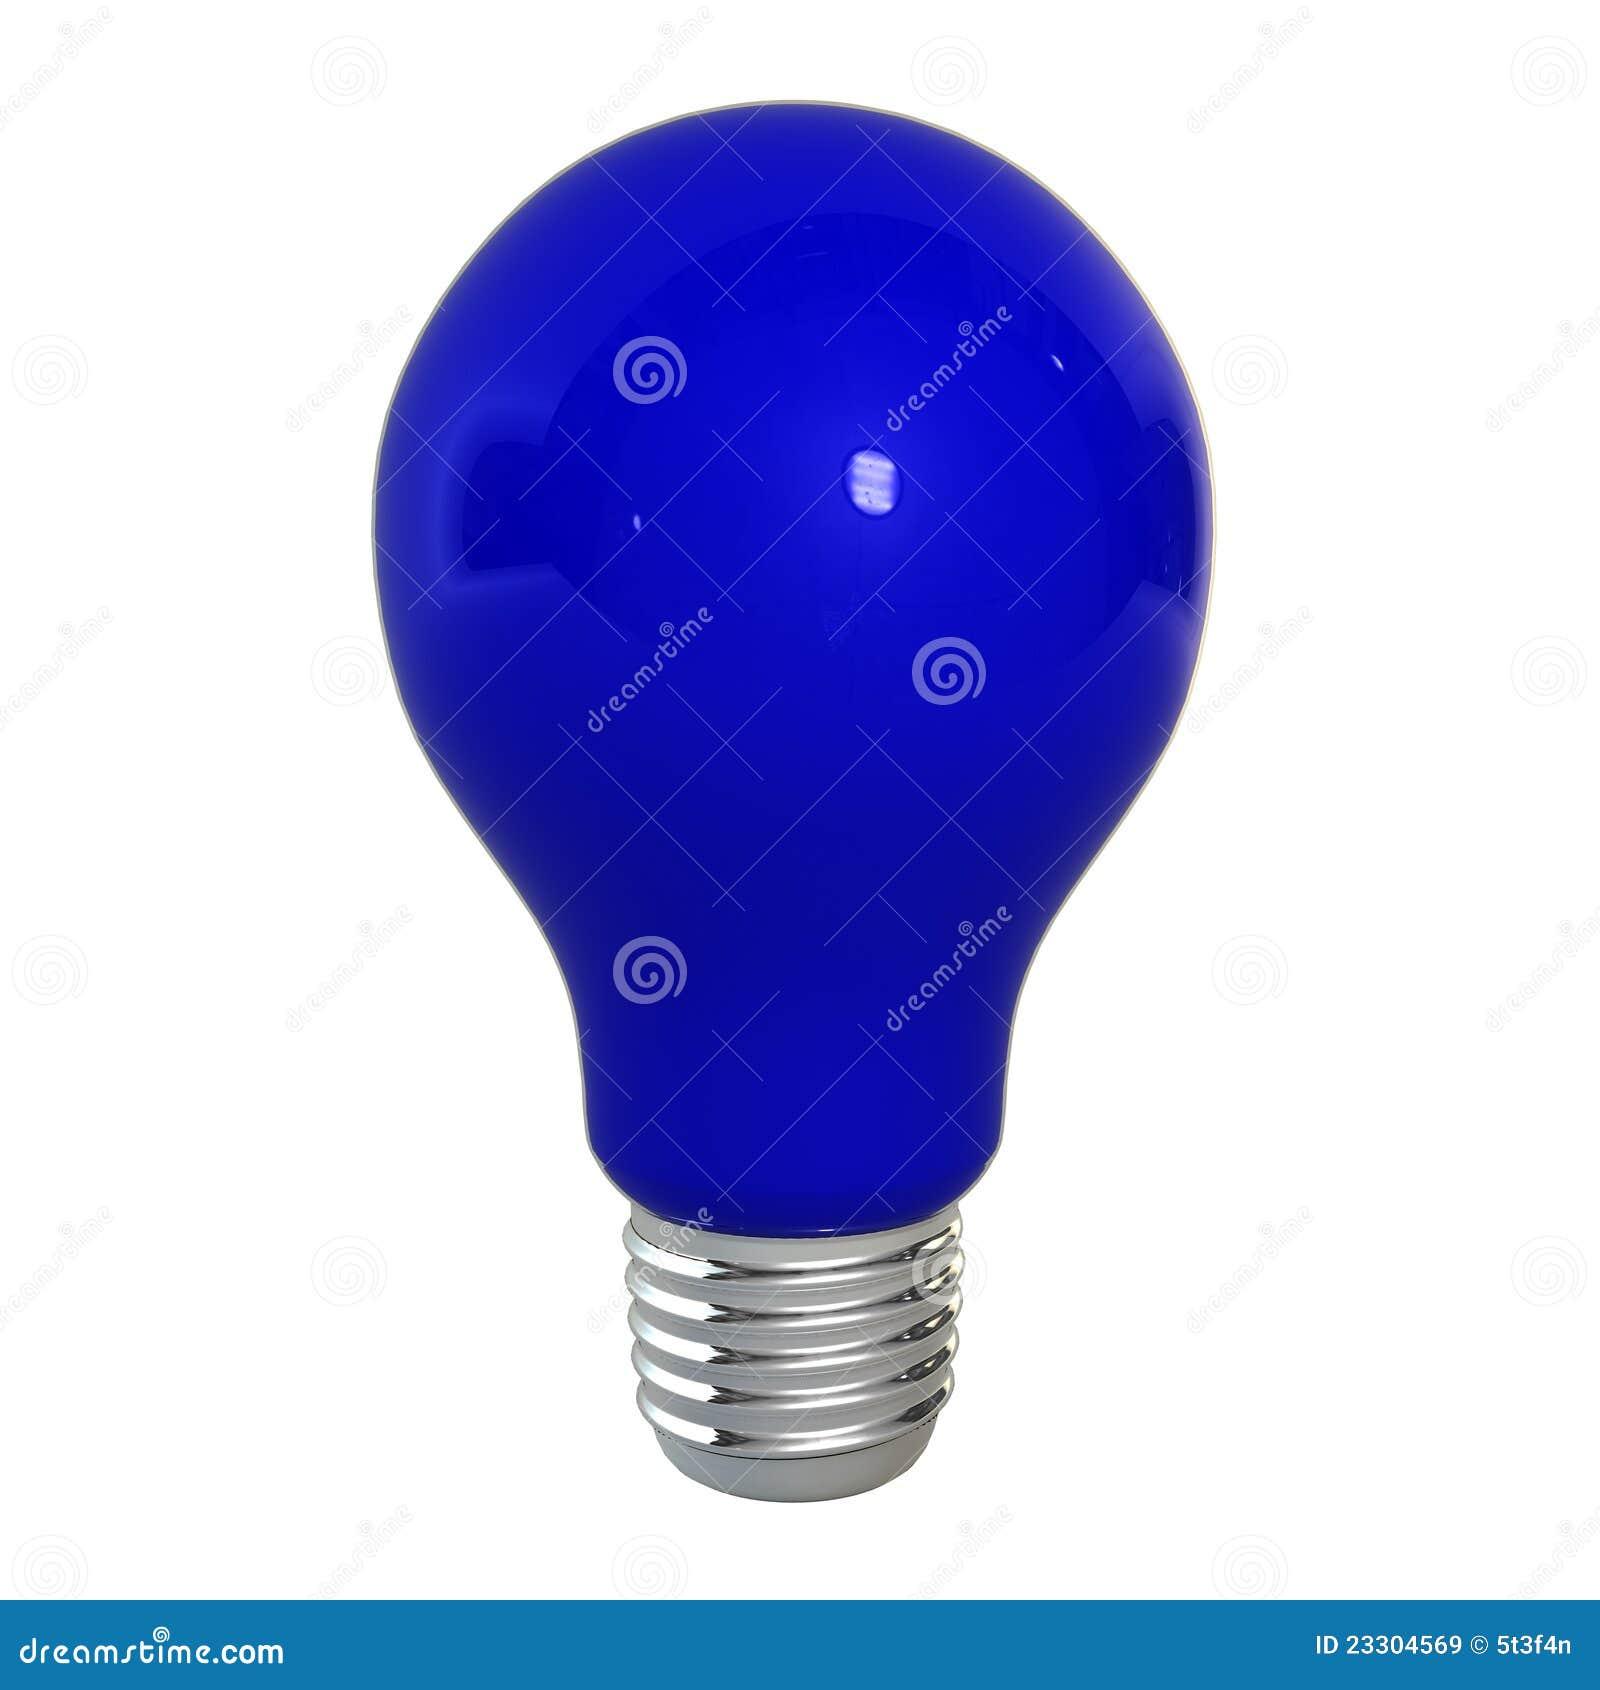 lampadina blu : Lampadina Blu Immagini Stock Libere da Diritti - Immagine: 23304569